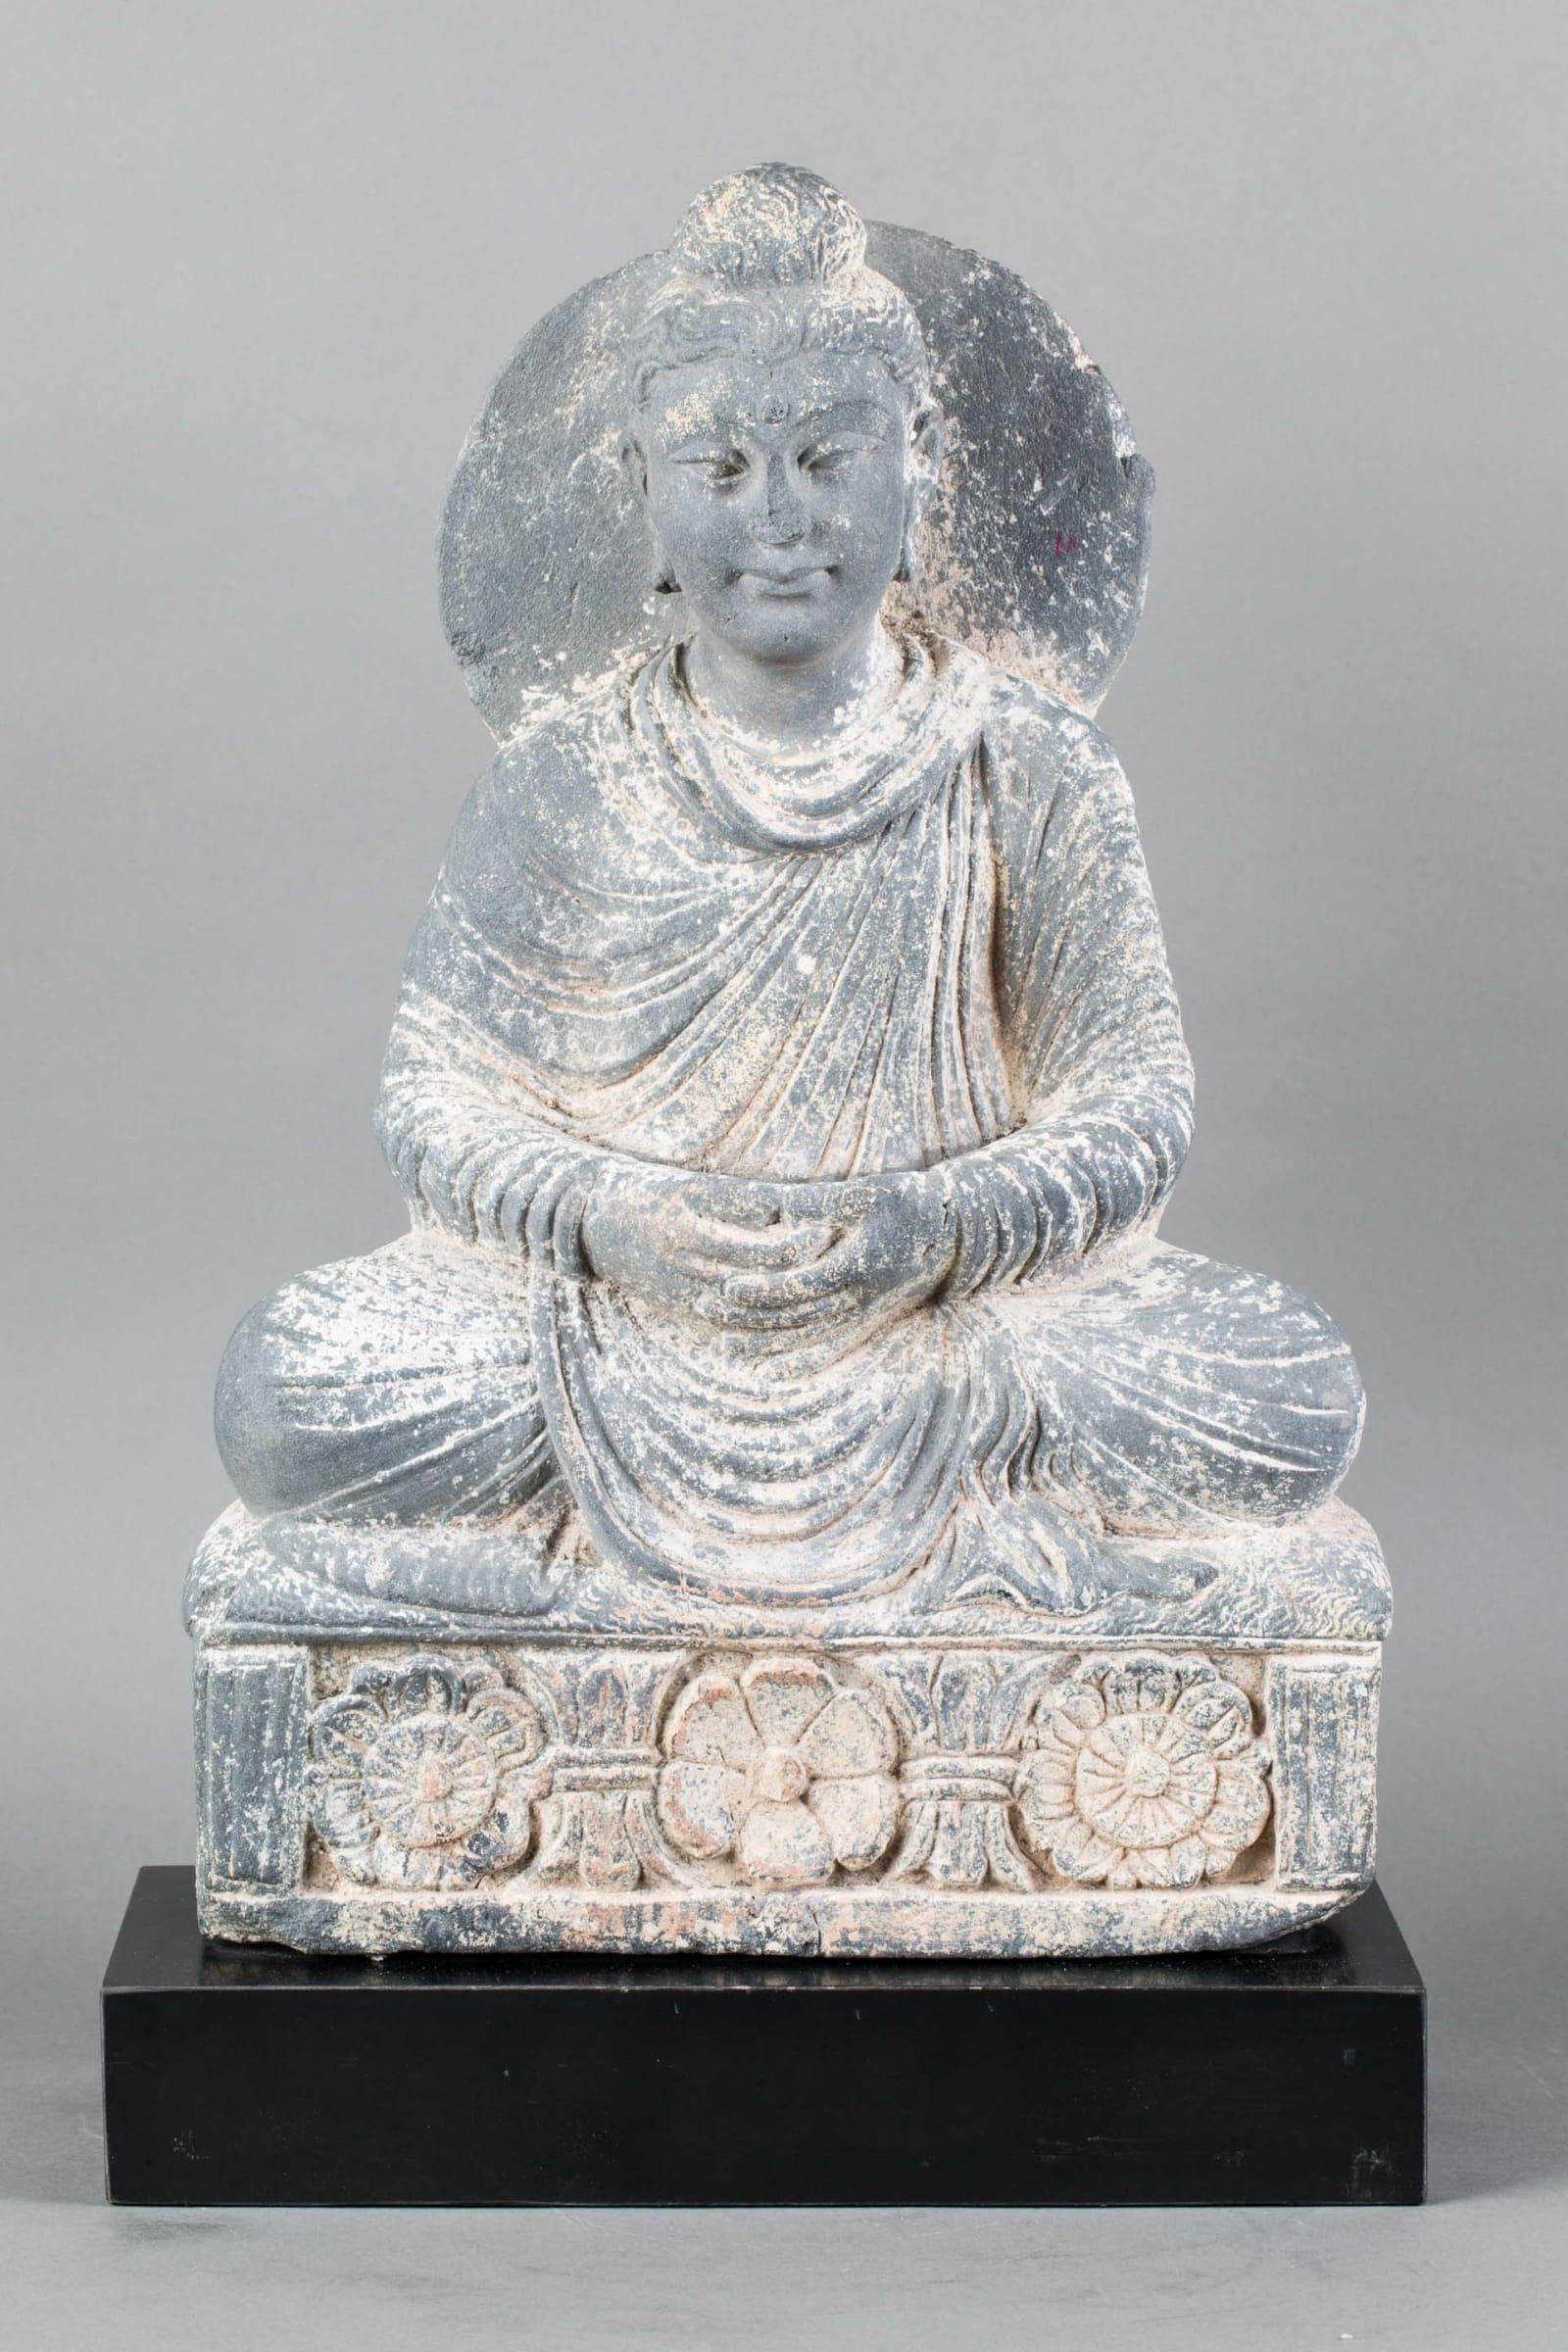 Schist Stone Gandhara Statue Of A Seated Buddha 200 Ce 600 Ce Barakat Gallery